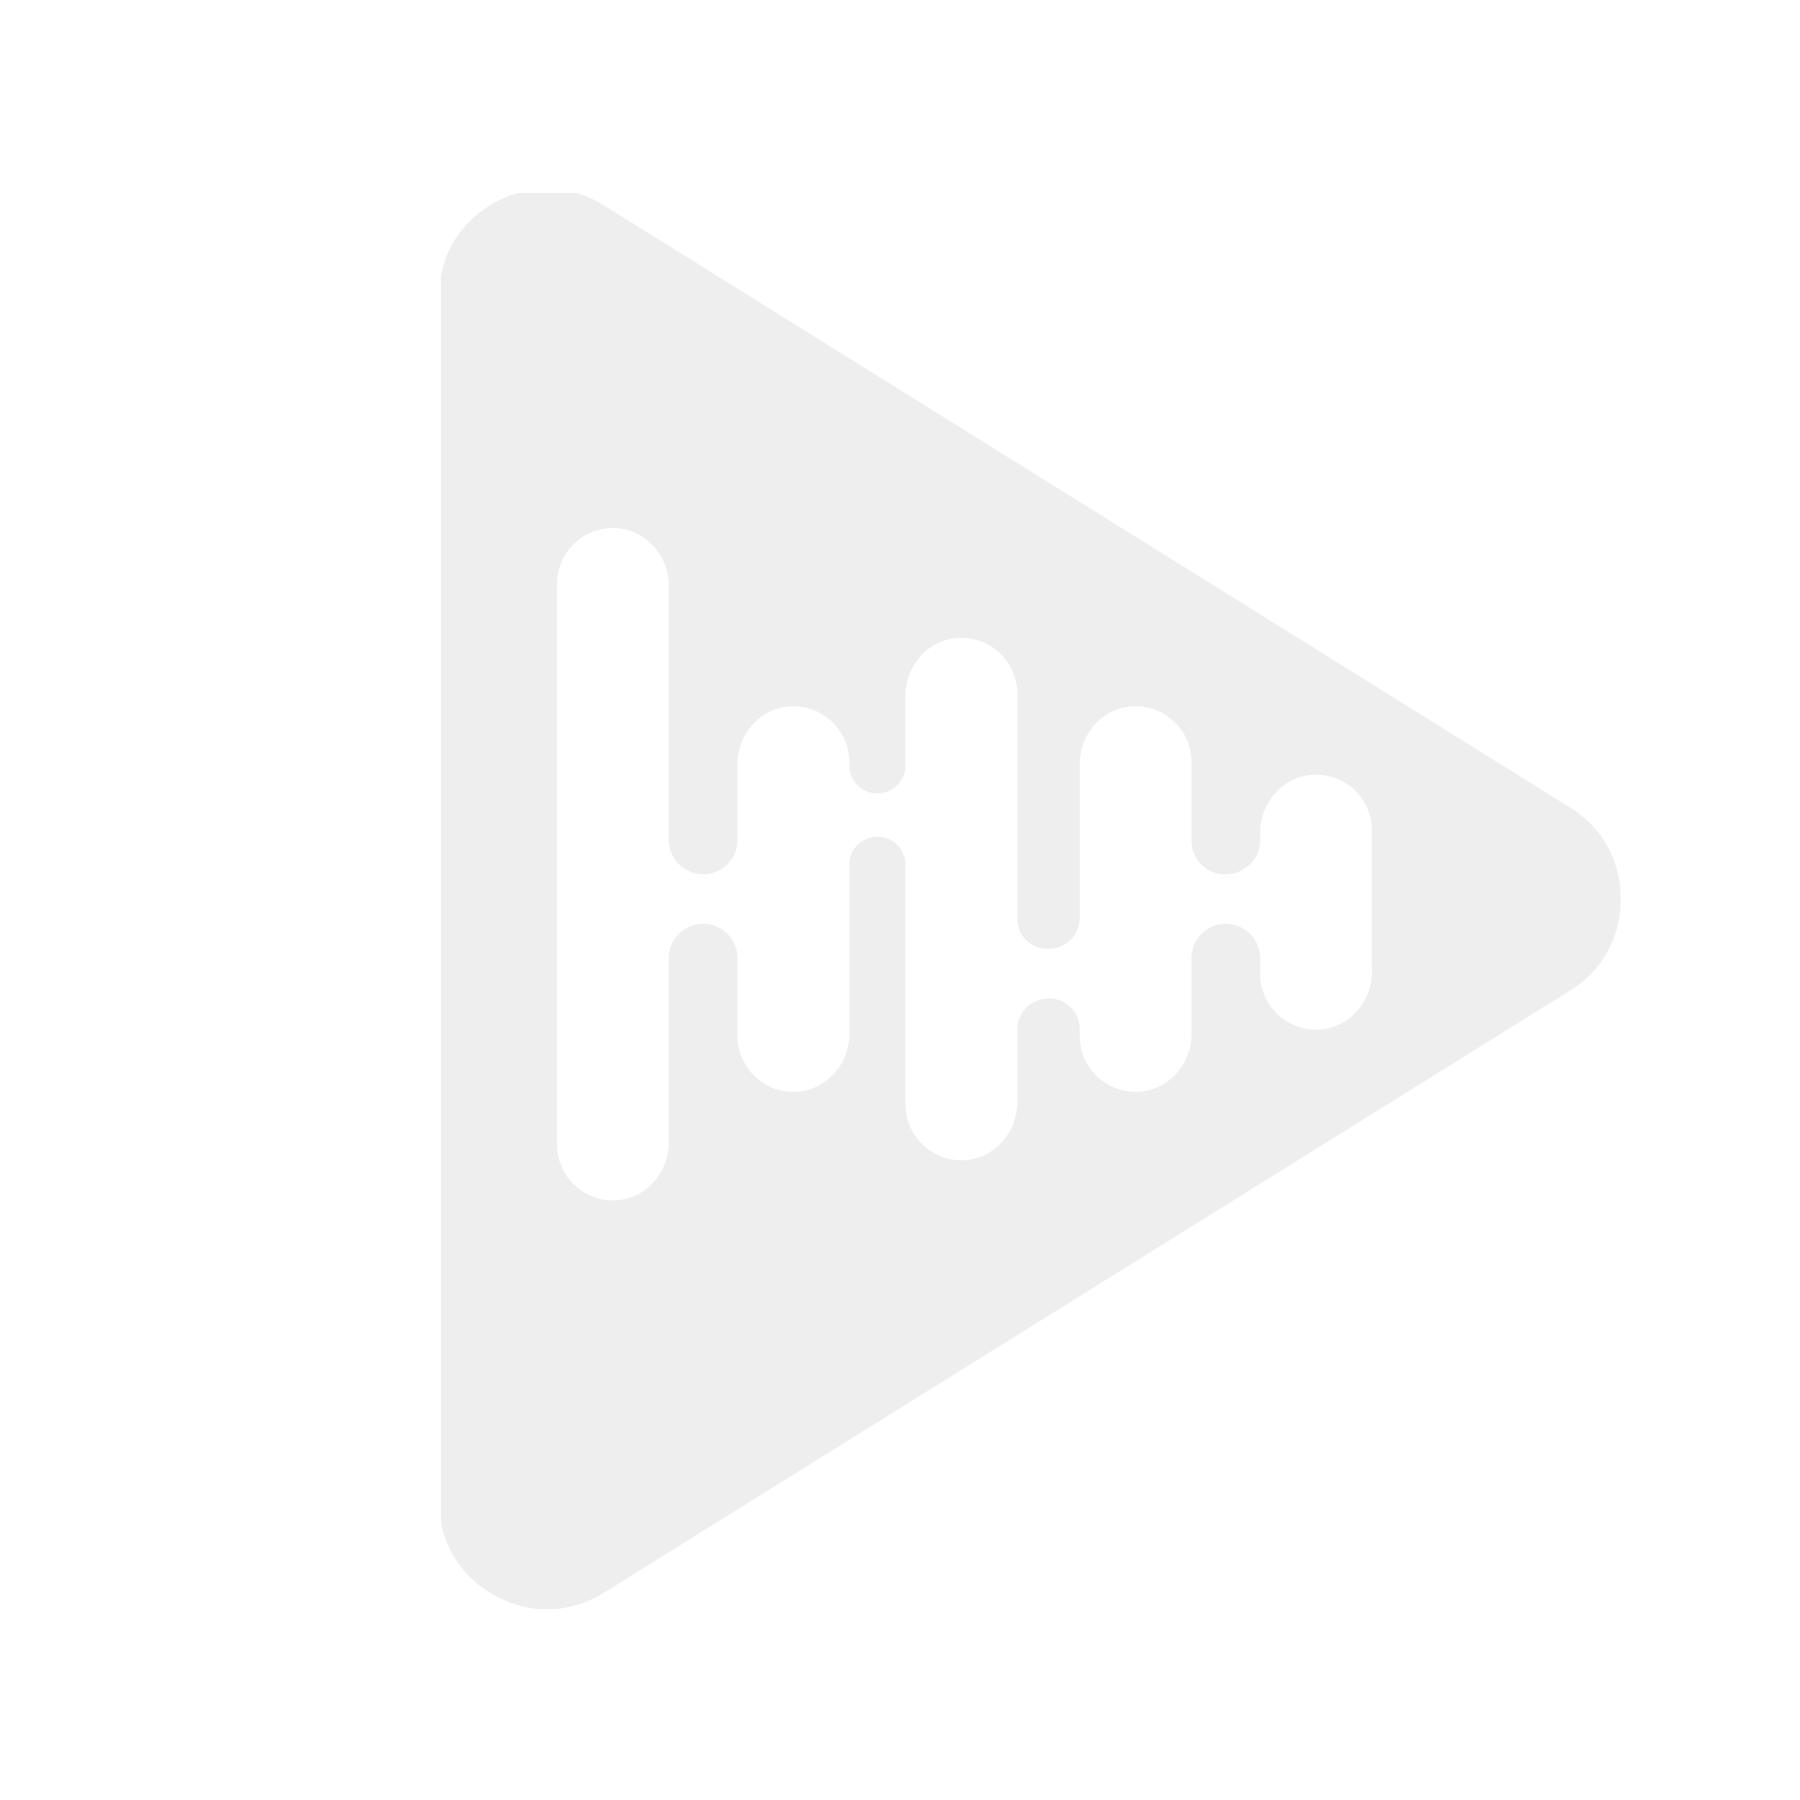 Phonocar VM265 - Biltilpasset ryggekamera